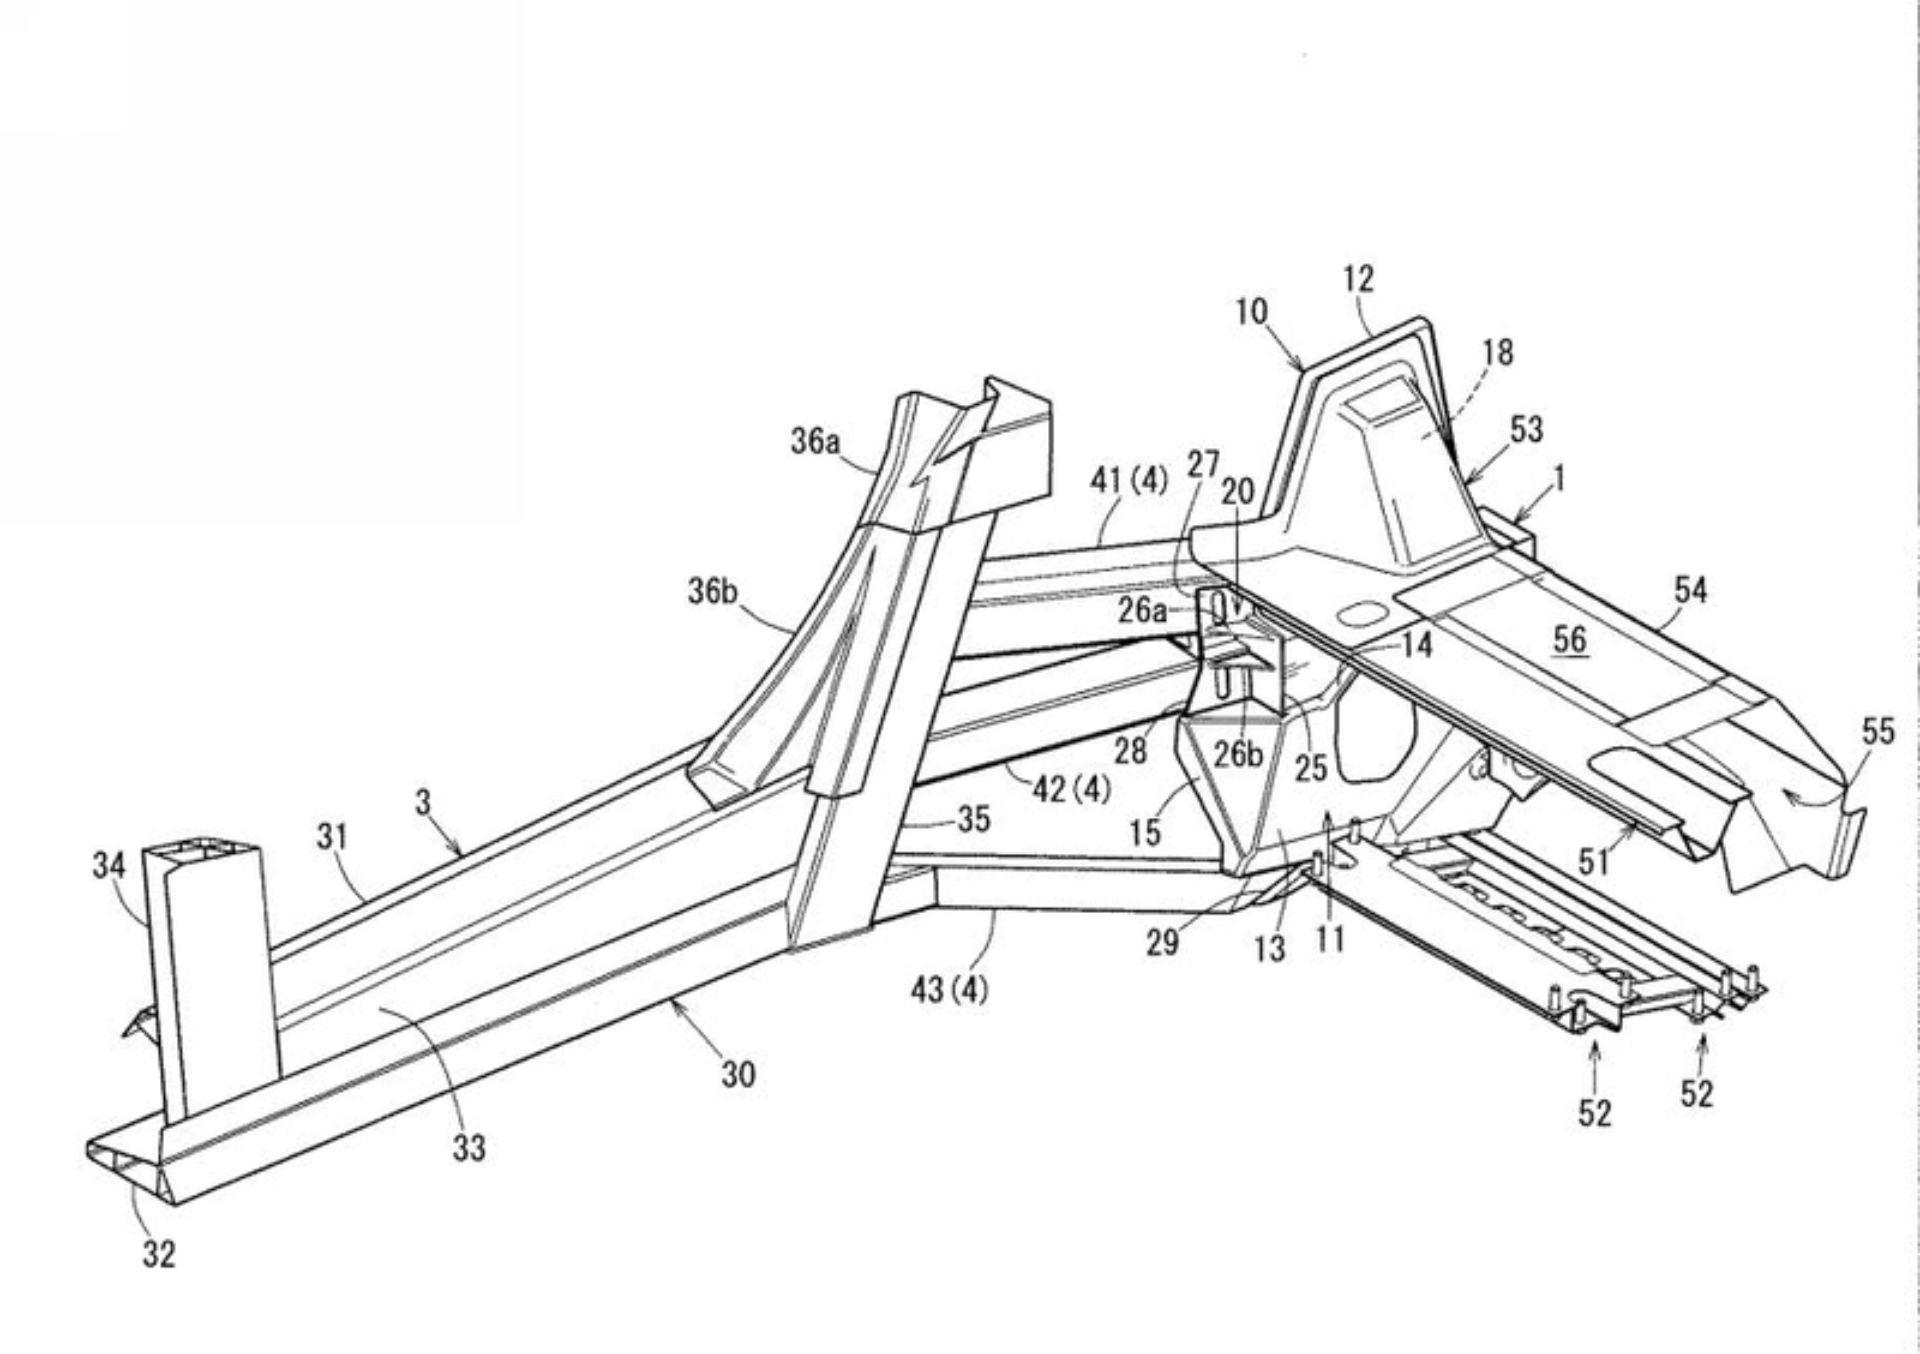 Mazda-Structure-patent-filing-3